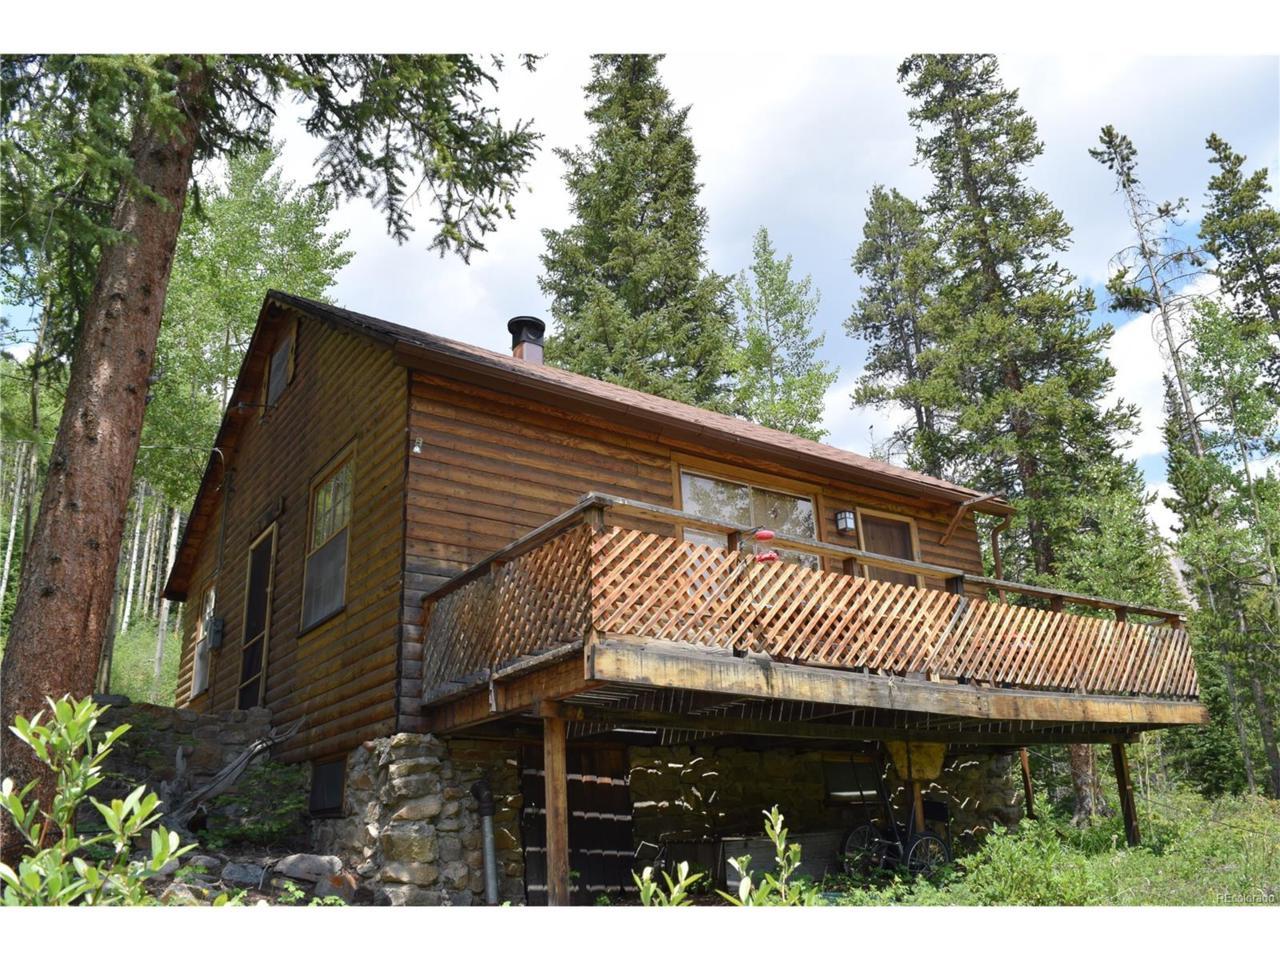 4361 Herman Gulch Road, Silver Plume, CO 80476 (MLS #7986003) :: 8z Real Estate